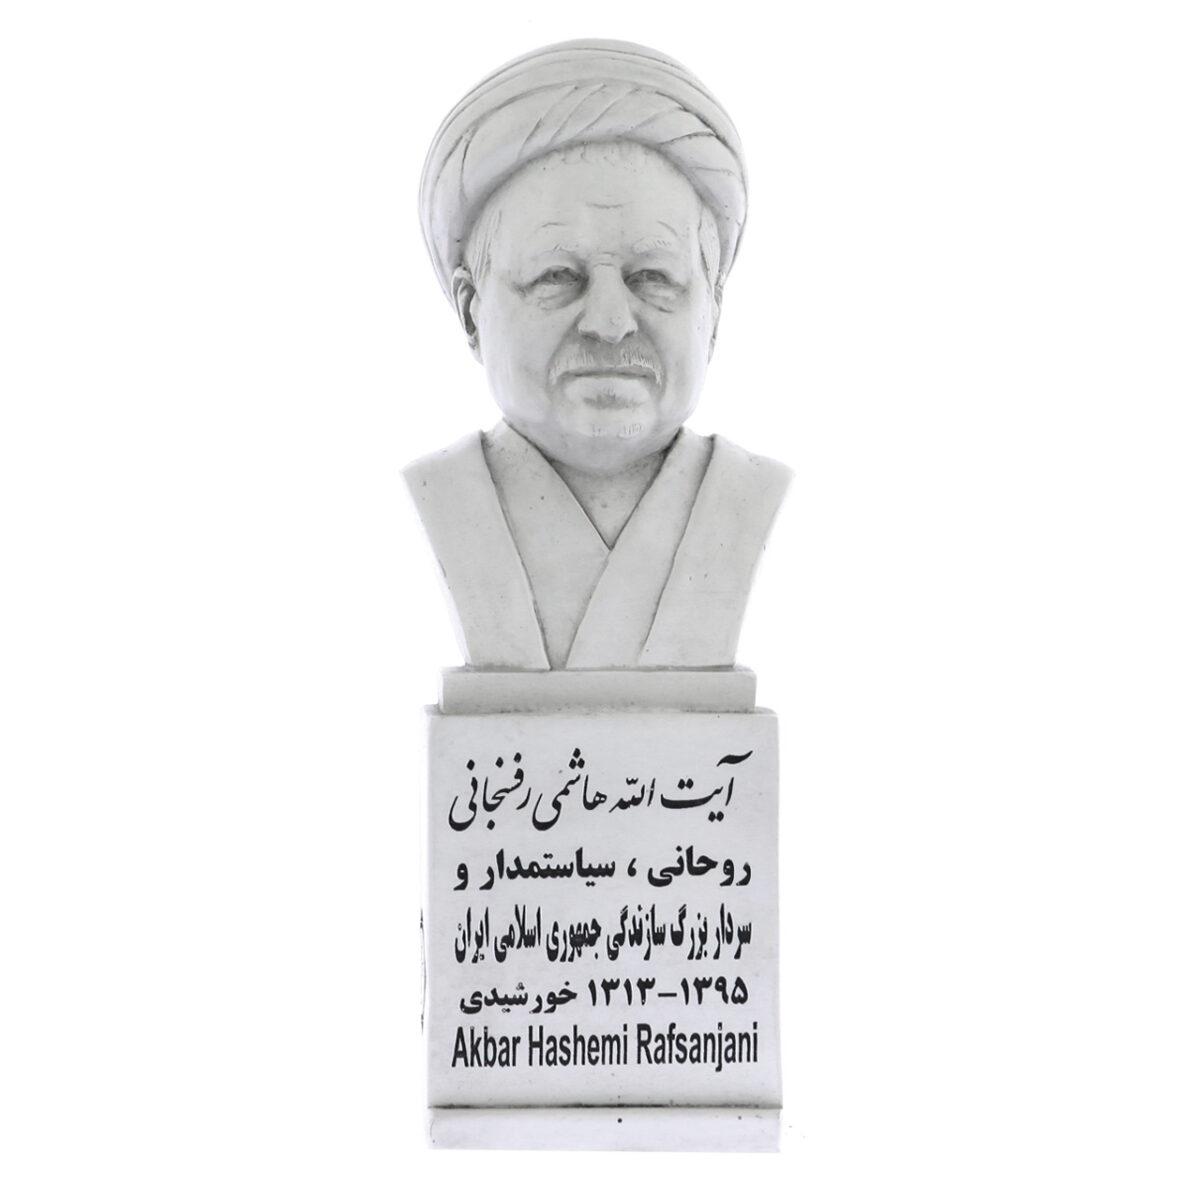 rafsanjani s 1200x1200 - سردیس آیت الله اکبر هاشمی رفسنجانی